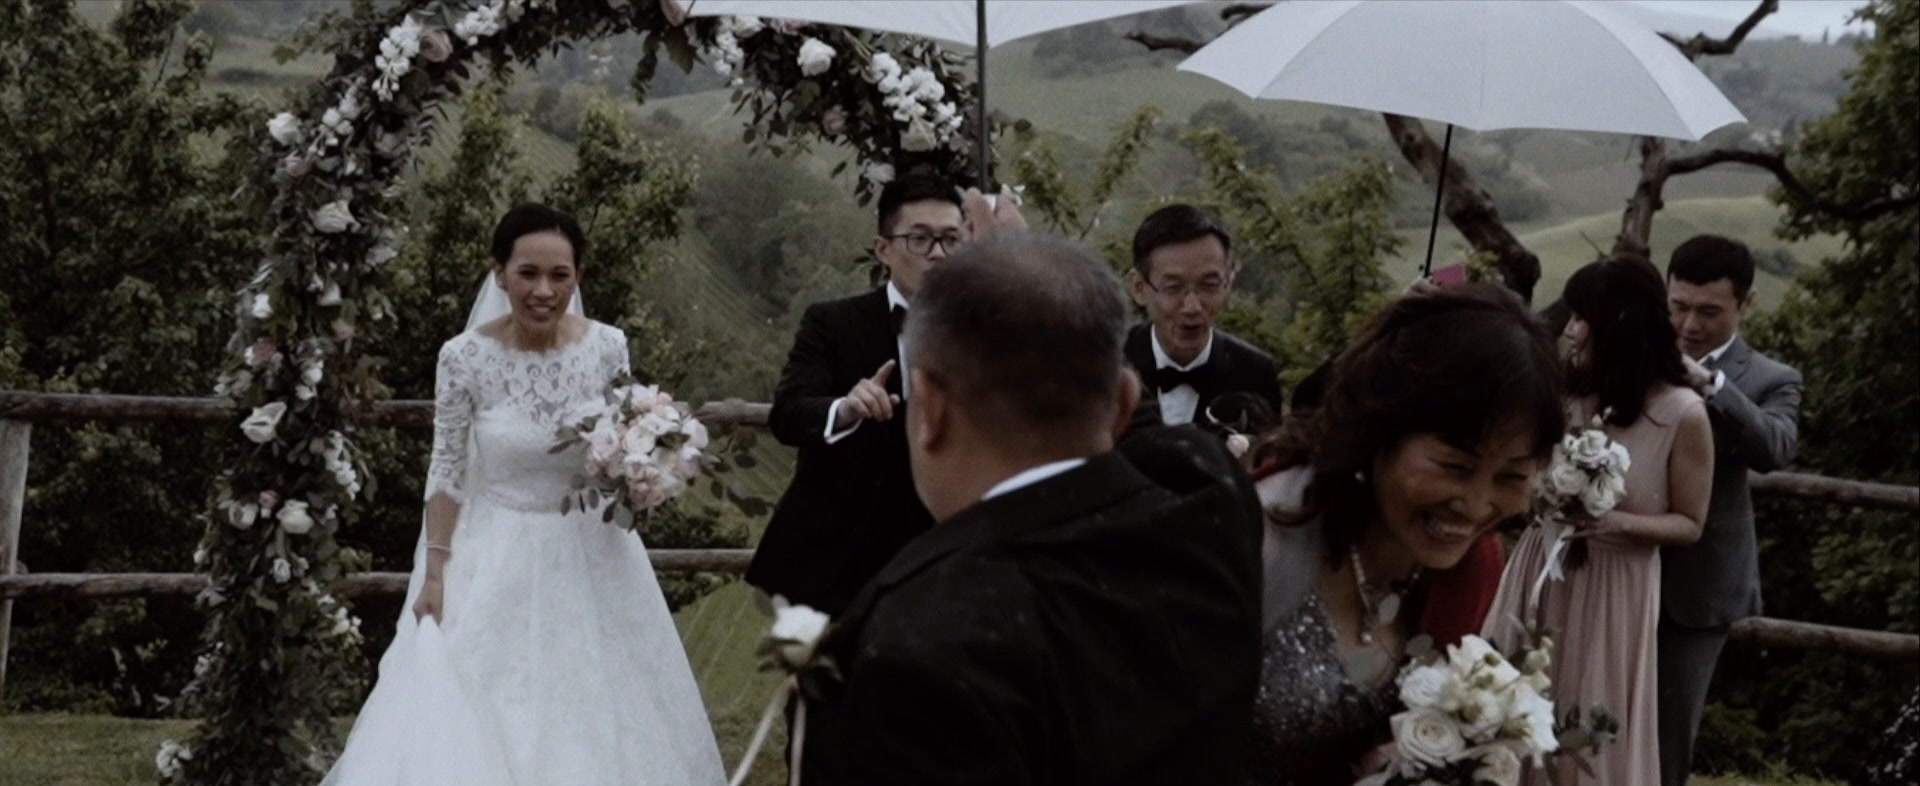 Karylle + Chun Man | San Gimignano, Italy | La Lucciolaia